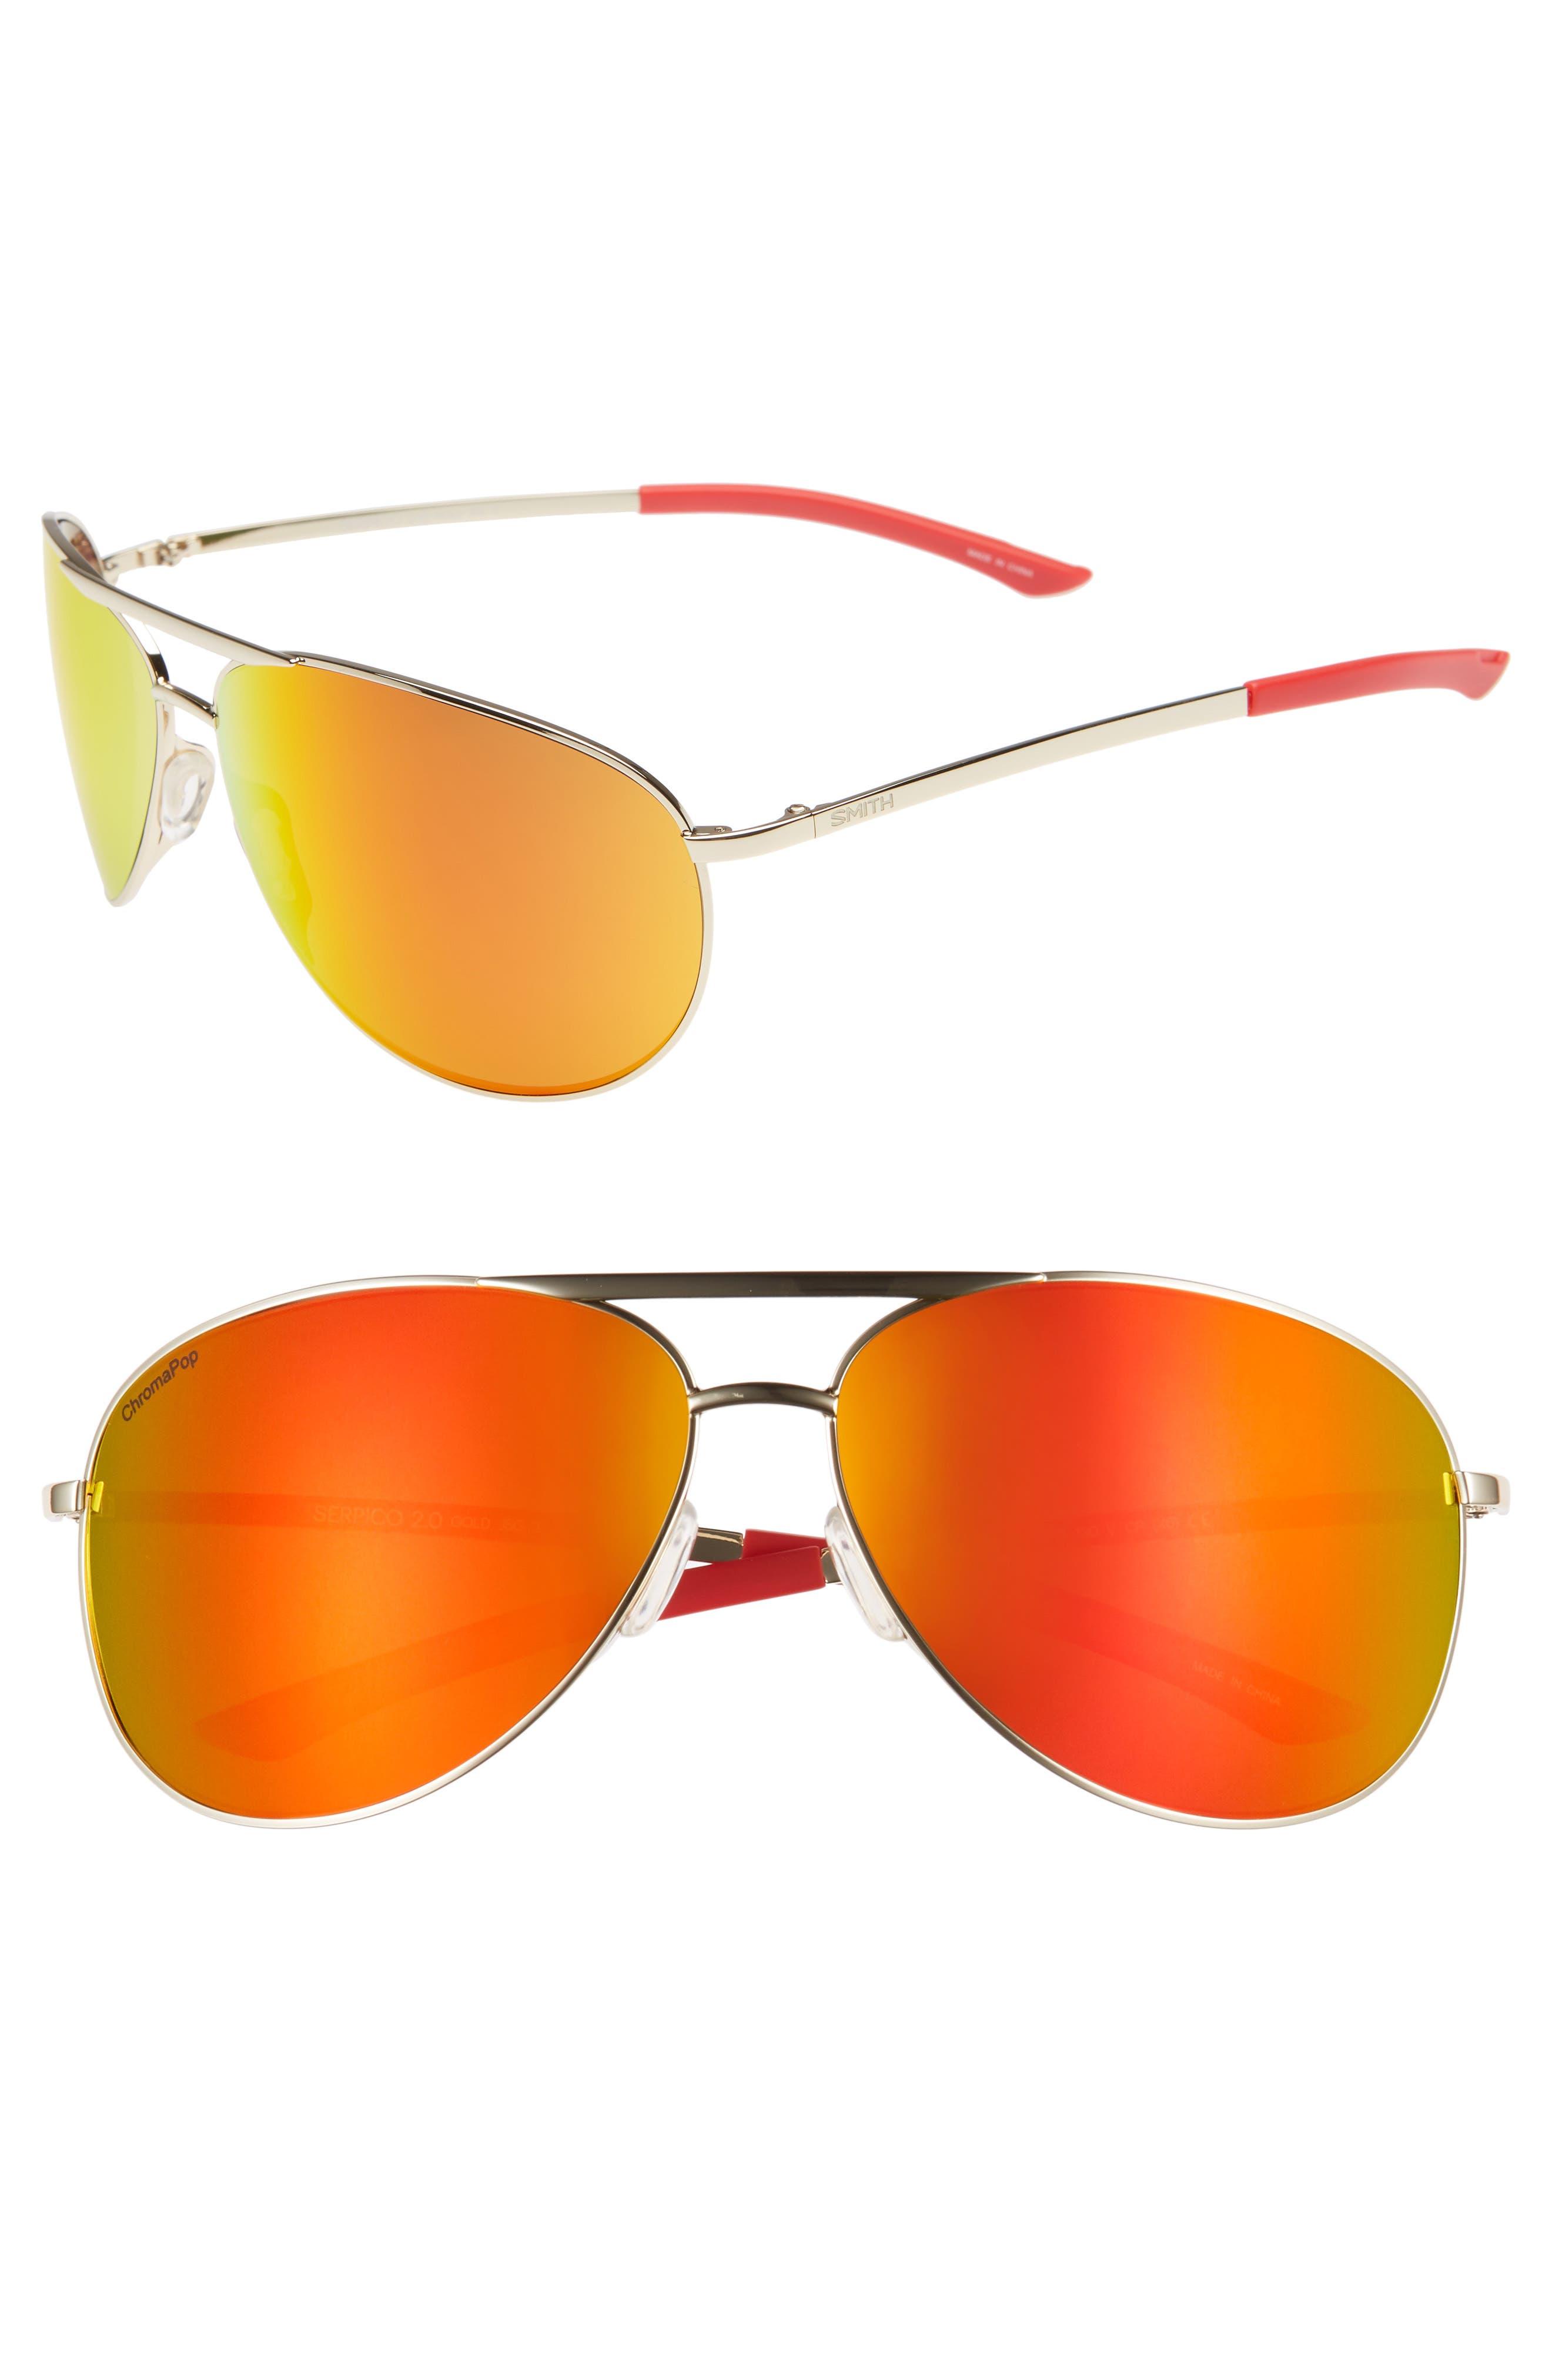 Serpico 2 65mm Mirrored ChromaPop<sup>™</sup> Aviator Sunglasses,                             Main thumbnail 1, color,                             GOLD/ RED